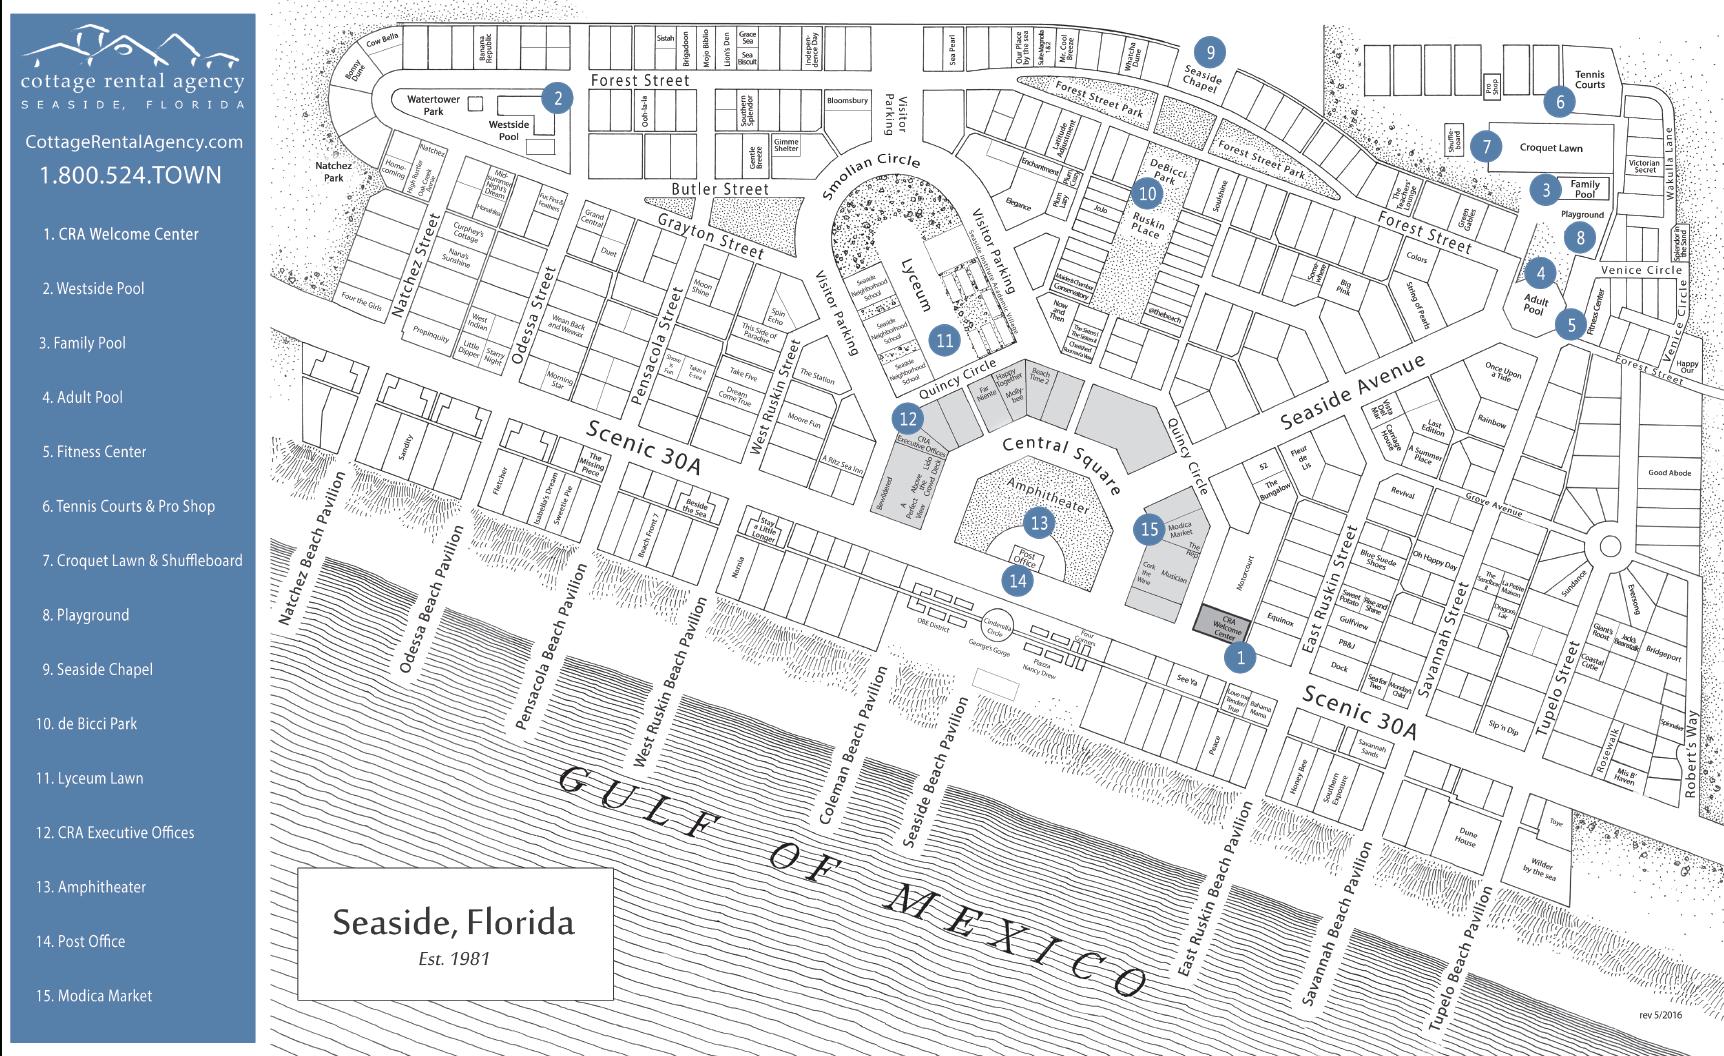 Seaside Fl Map - 2.10.samuelhill.co • - Seaside Florida Town Map